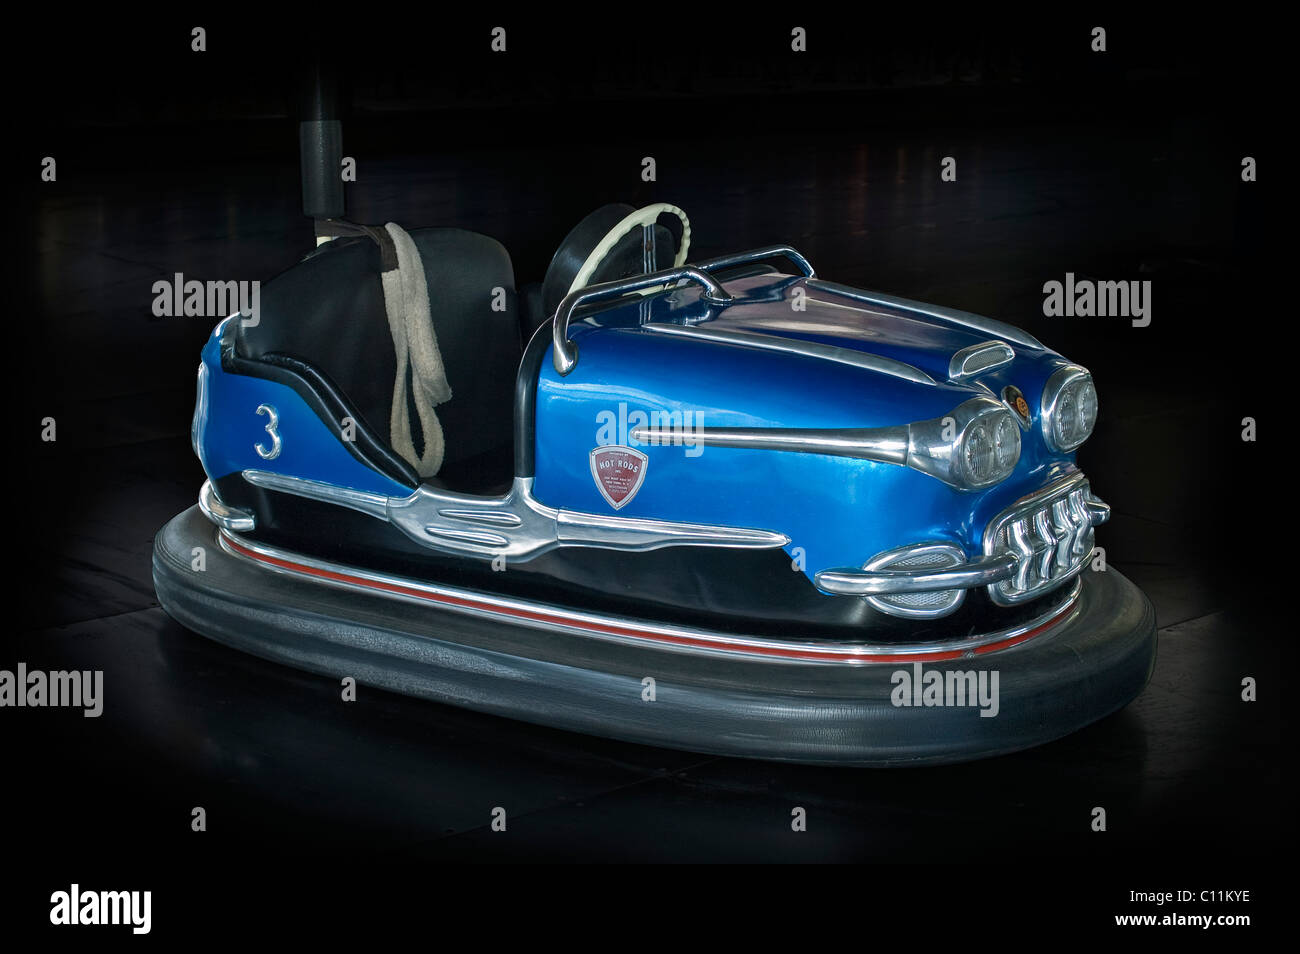 1960's Corvette bumper car - Stock Image